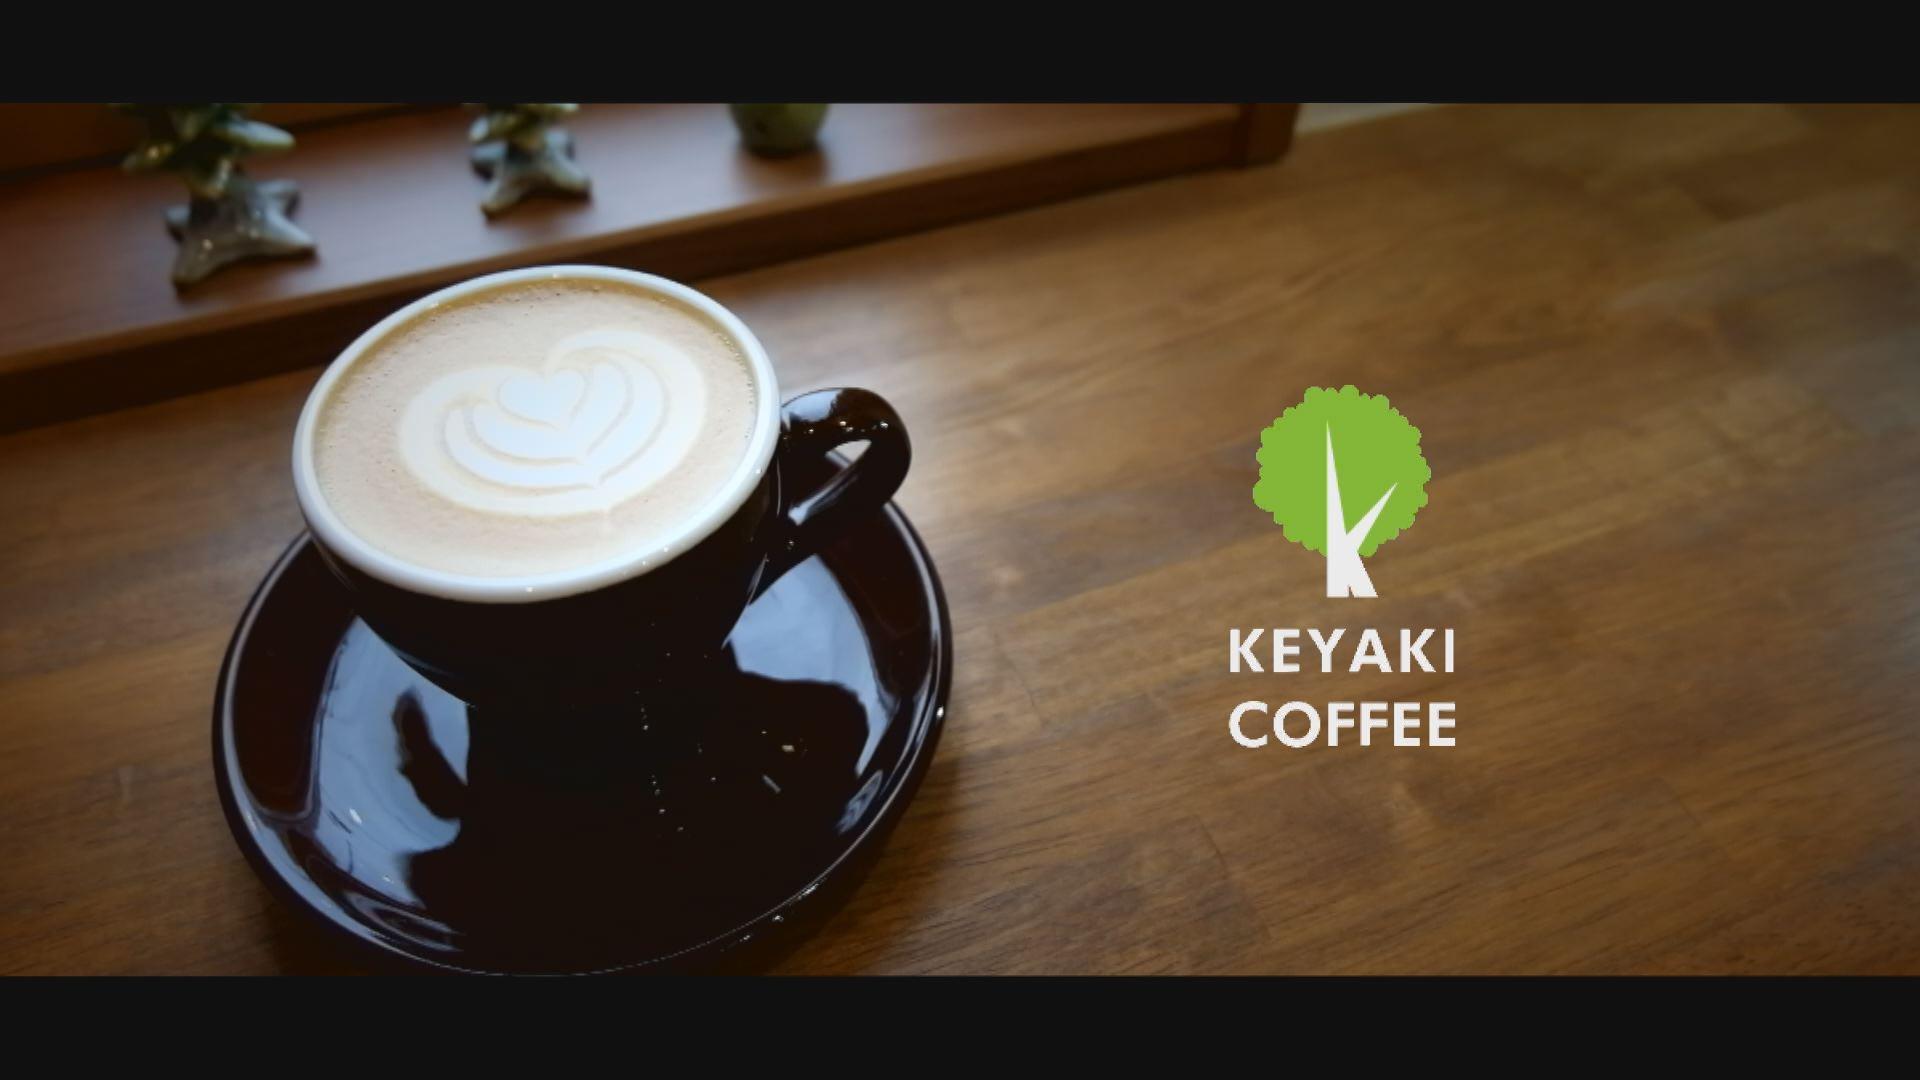 KEYAKI COFFEE 様